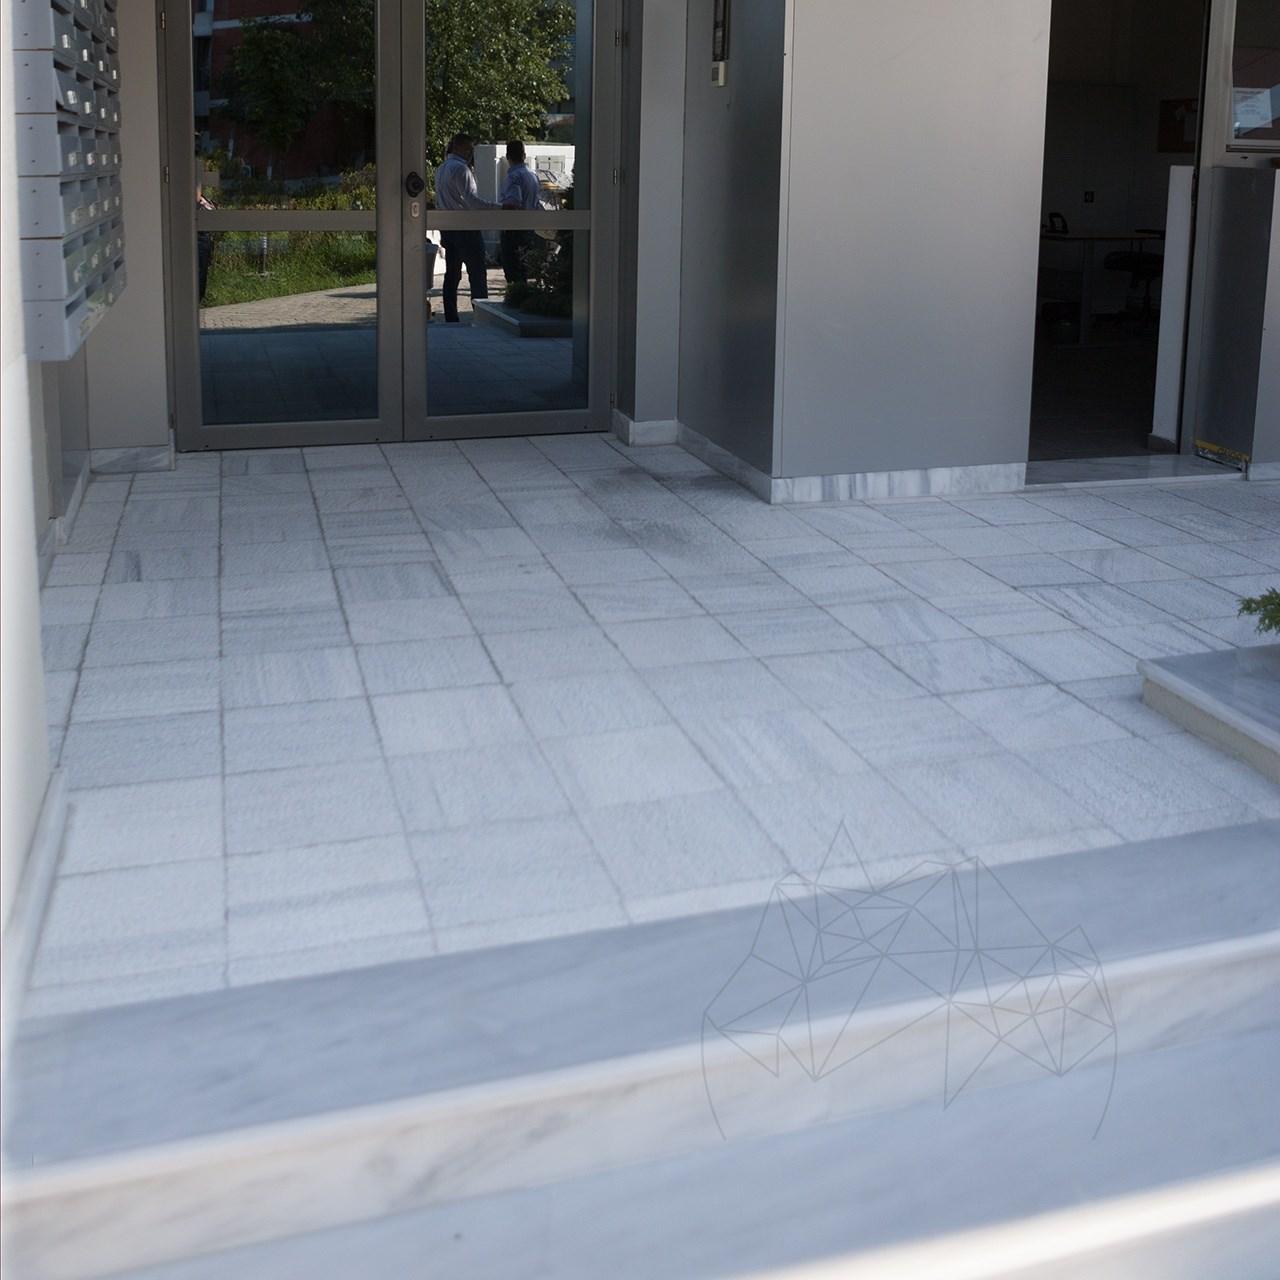 Kavala Polished Marble Stair 120 x 33 x 3 cm